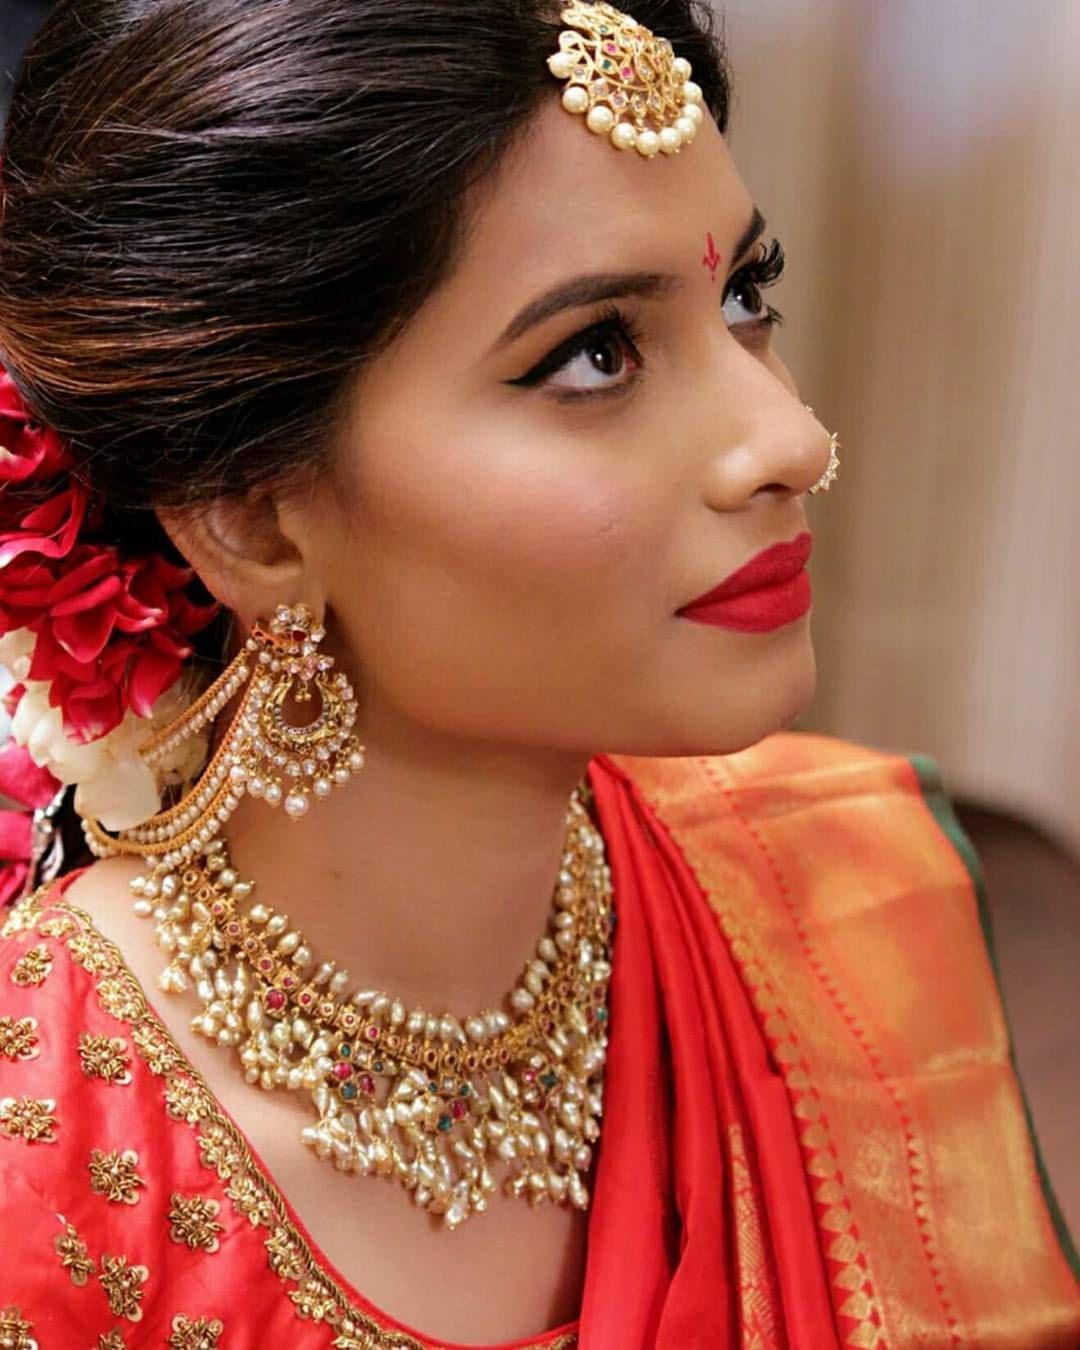 Kerala Marriage Bride Hair: 211 Likerklikk, 4 Kommentarer